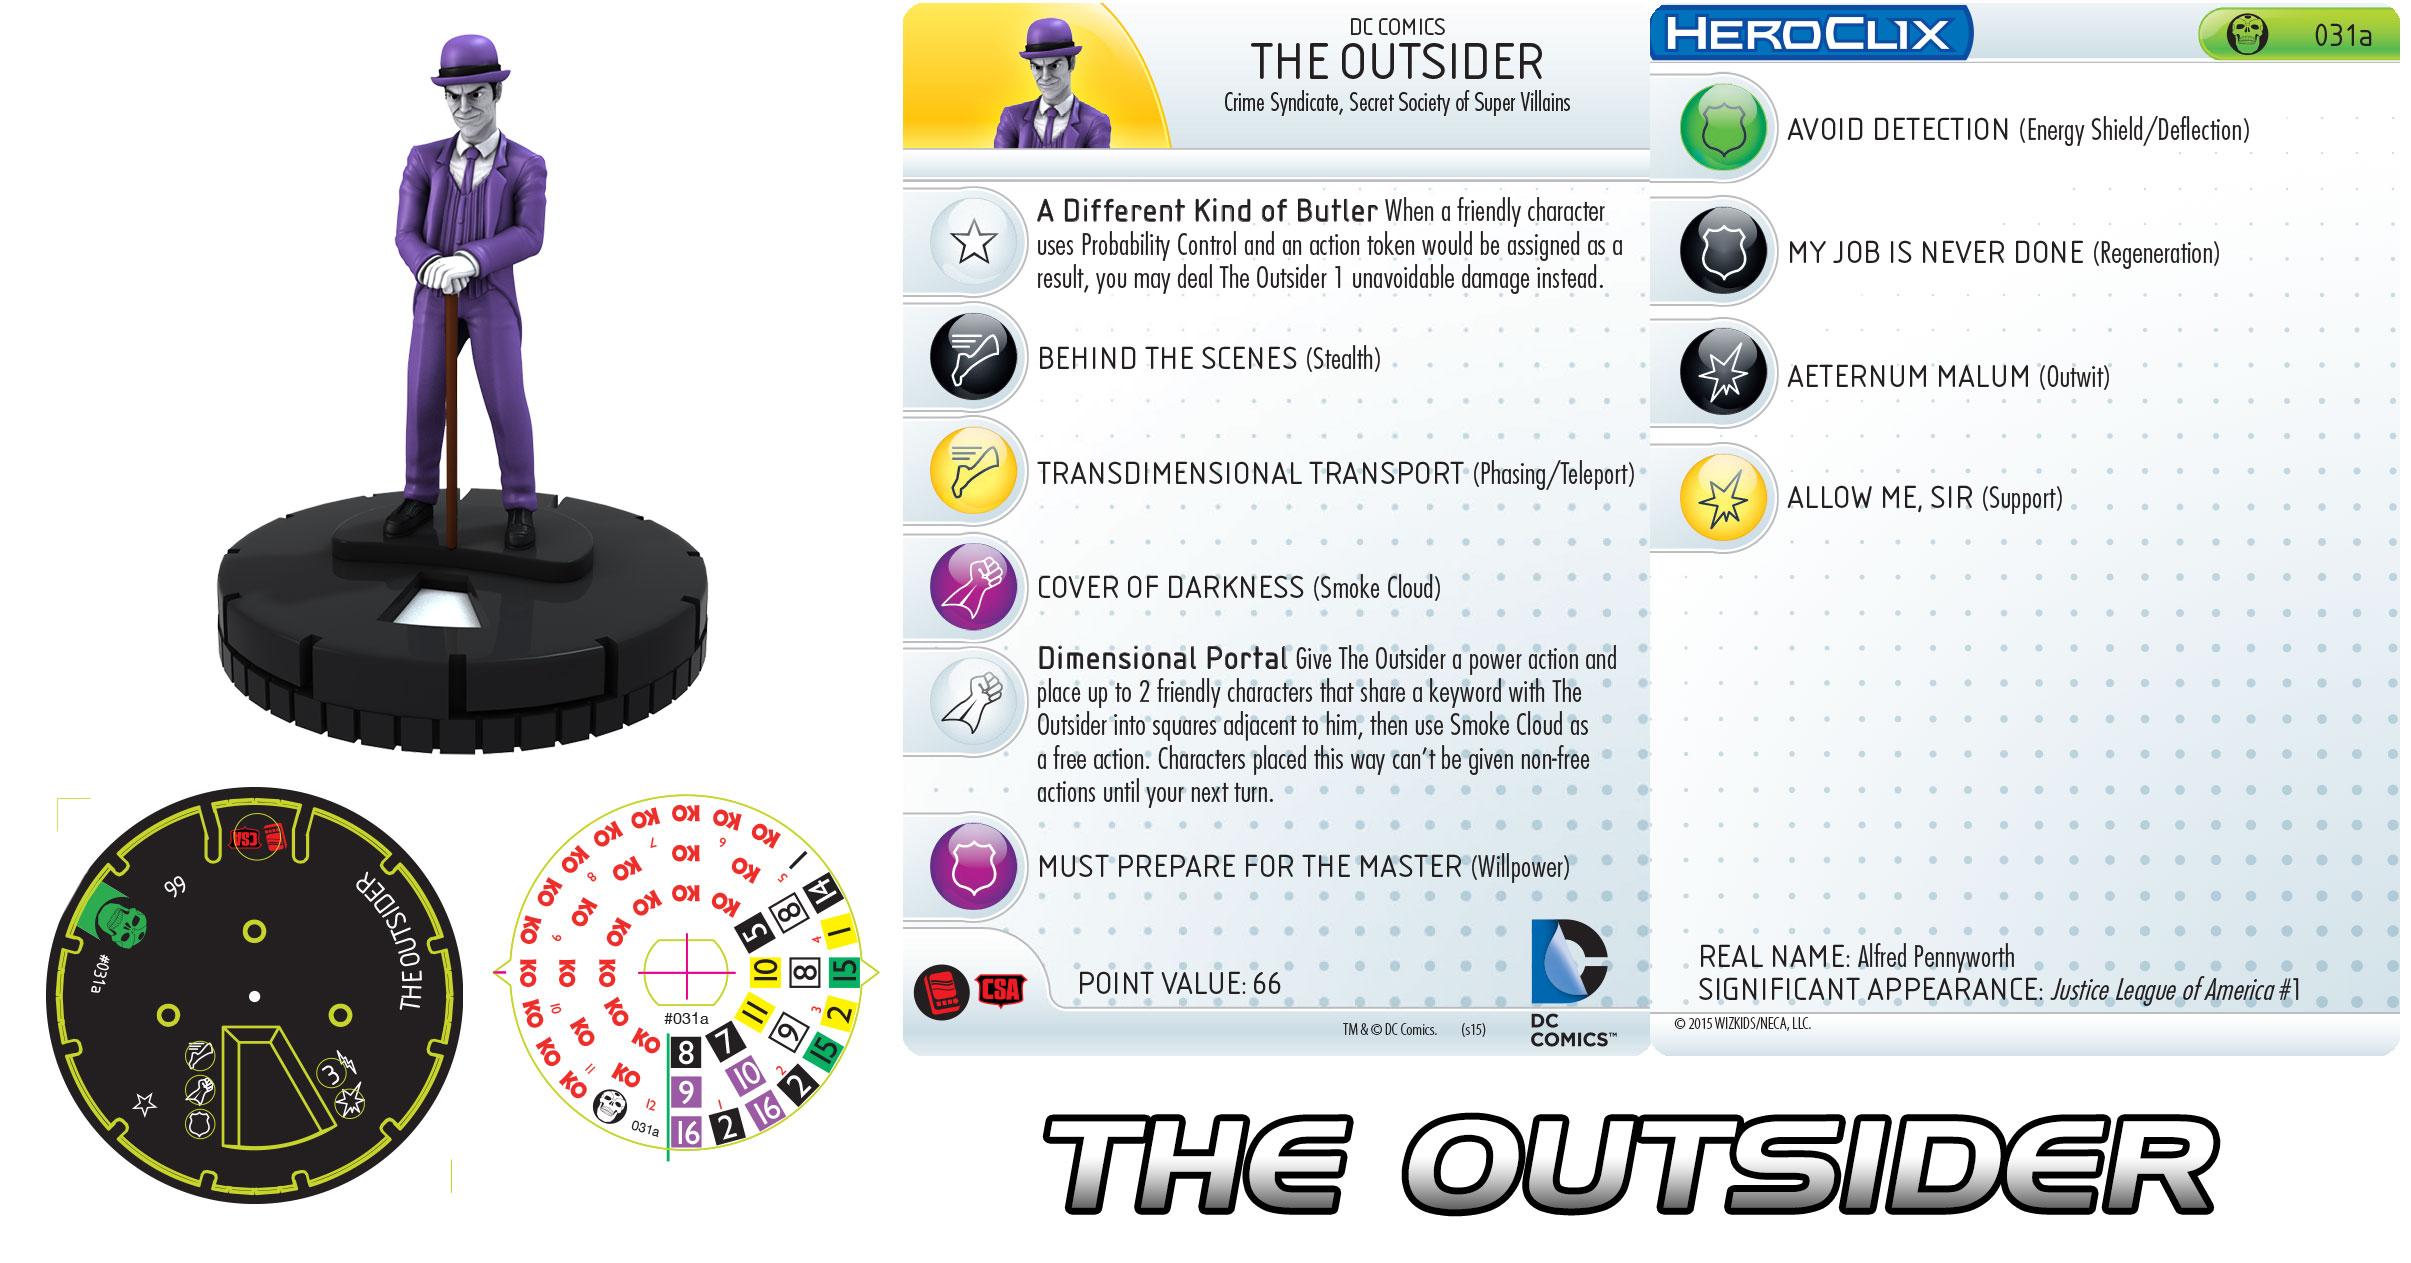 heroclix-the-outsider2.jpg